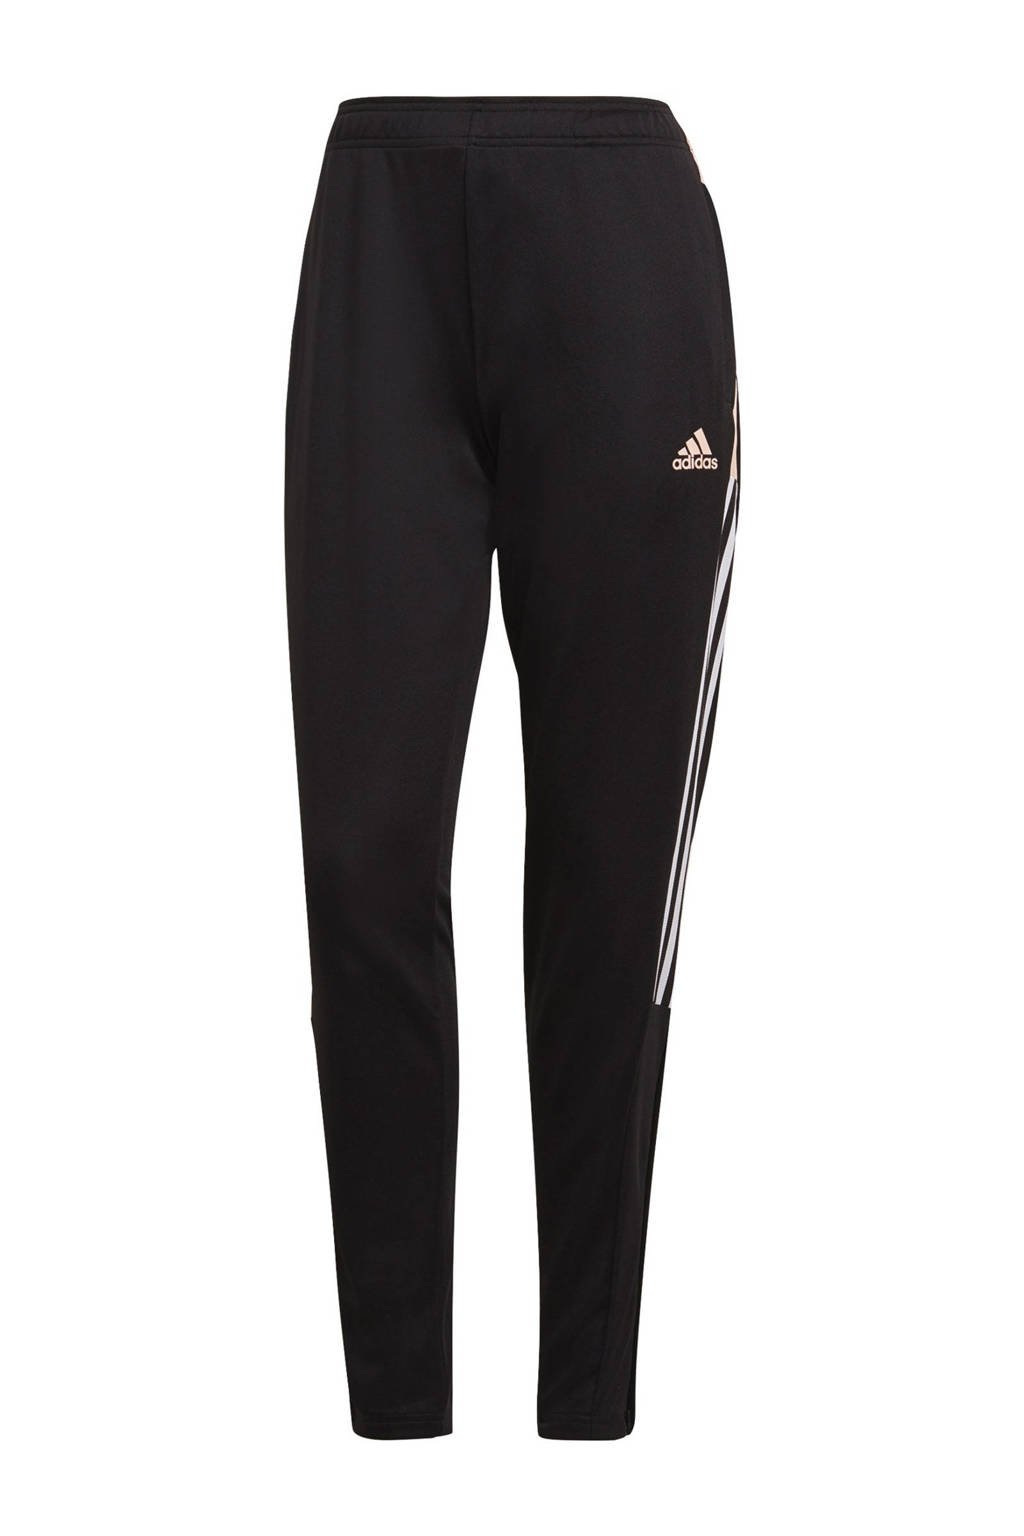 adidas Performance Tiro trainingsbroek zwart/roze, Zwart/roze